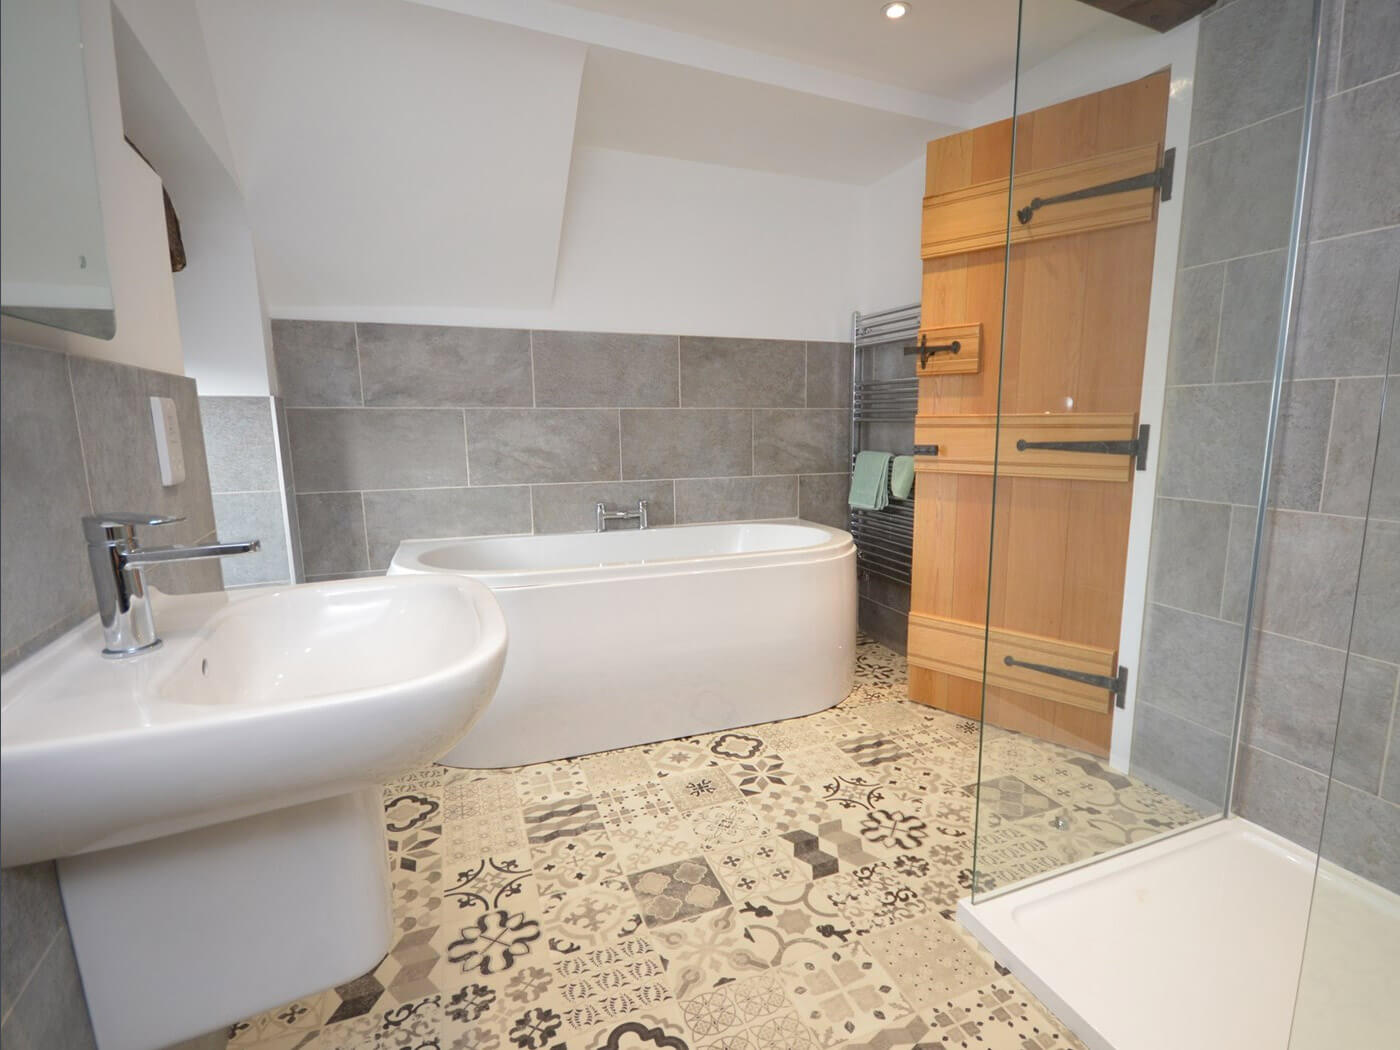 Quarzi Bathroom Tiles